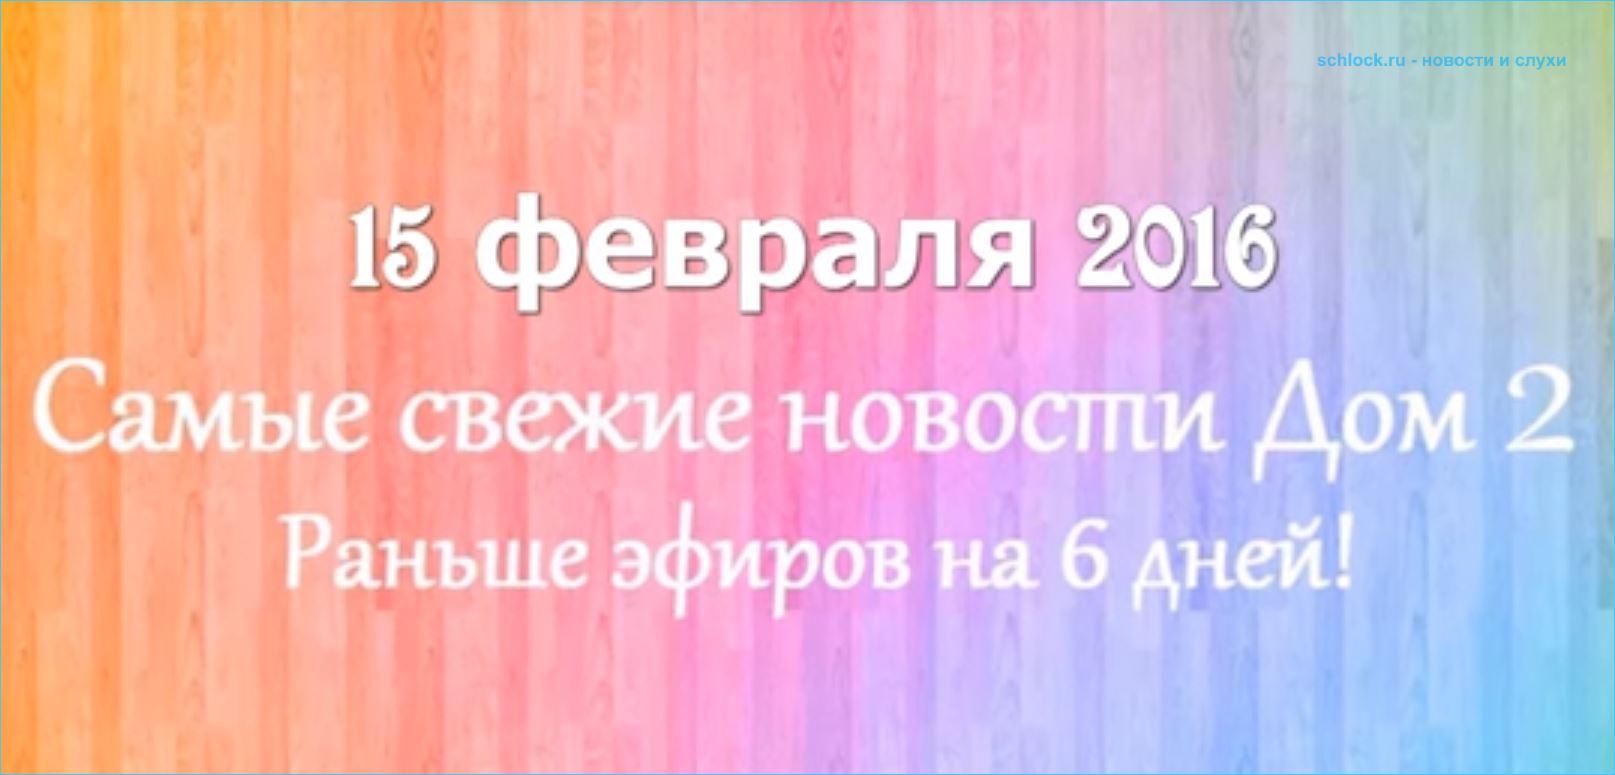 Последние новости дом 2 на 21.01.18